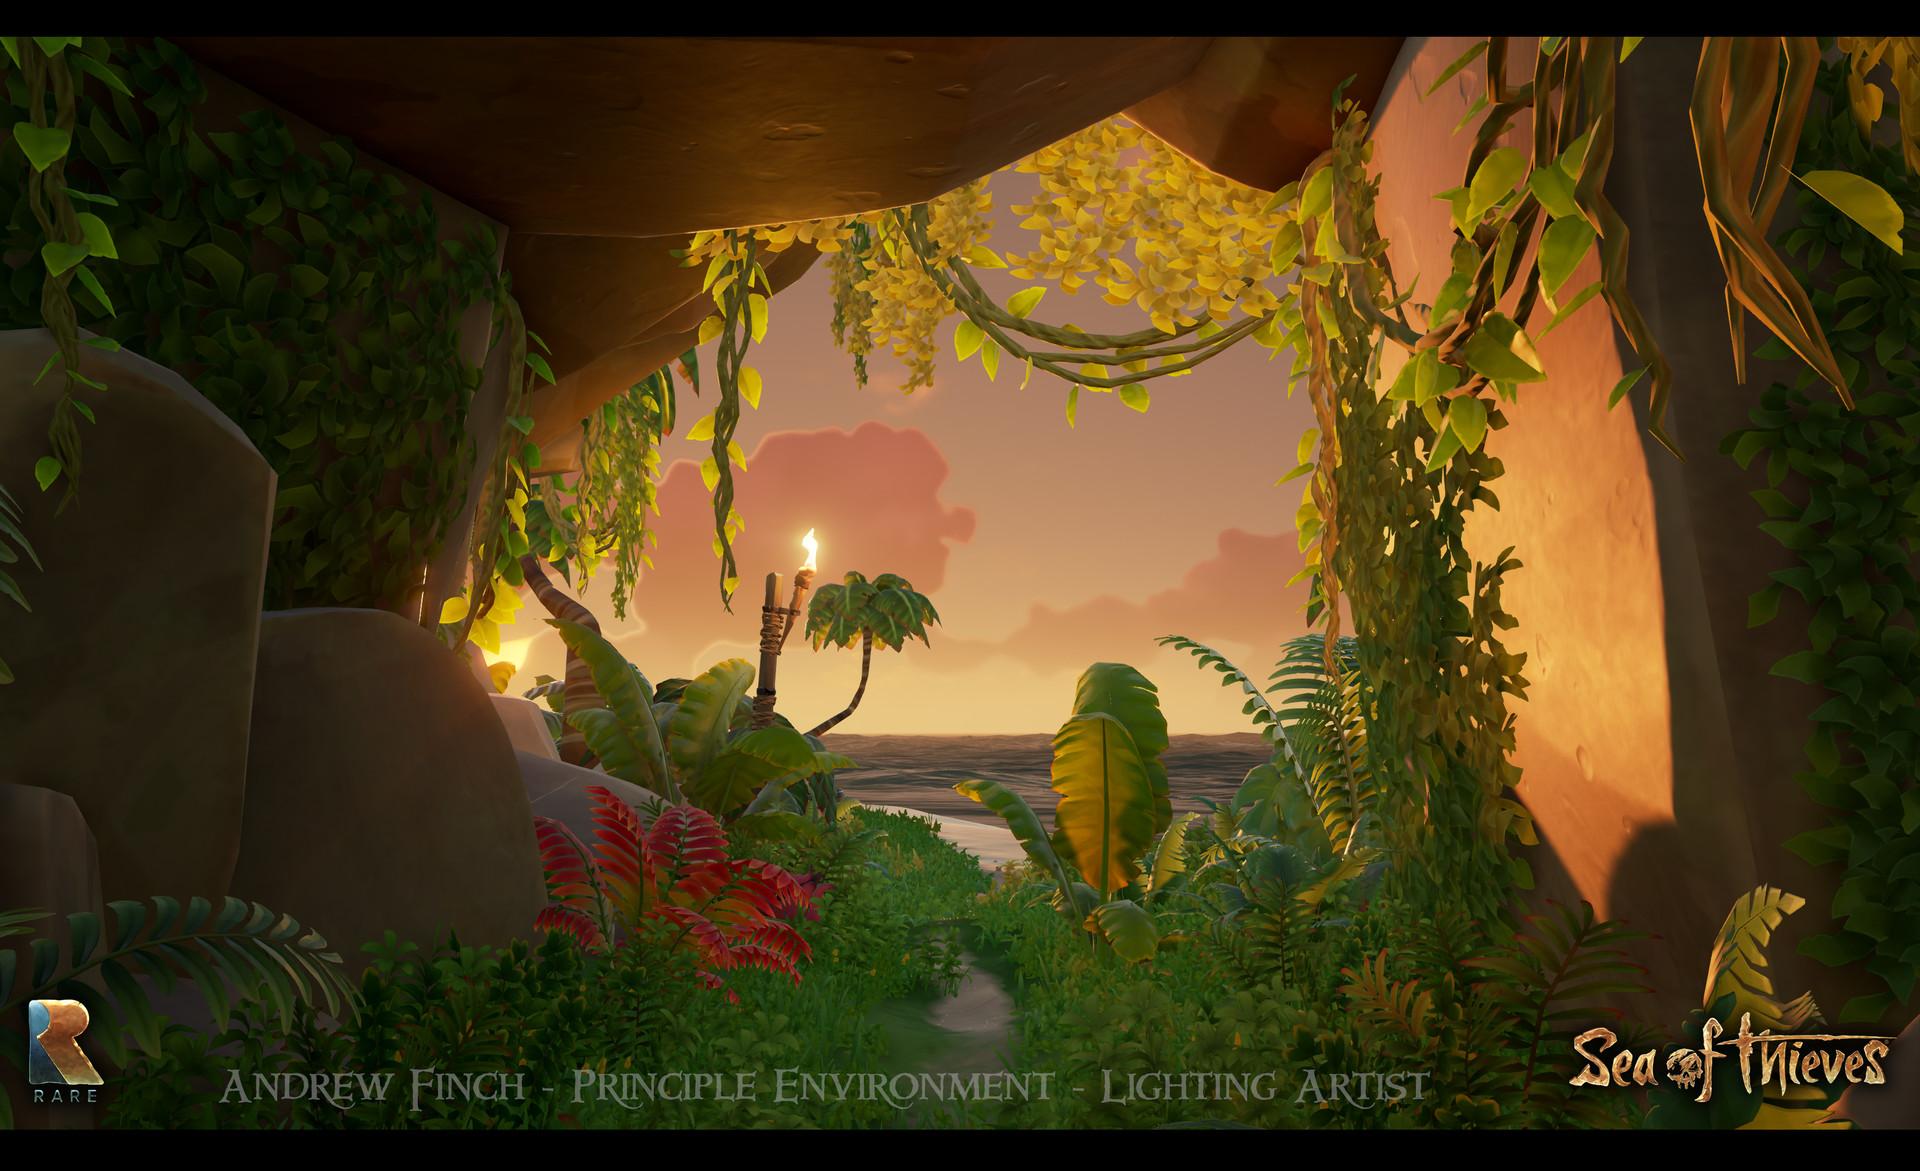 Andrew finch island lighting 31